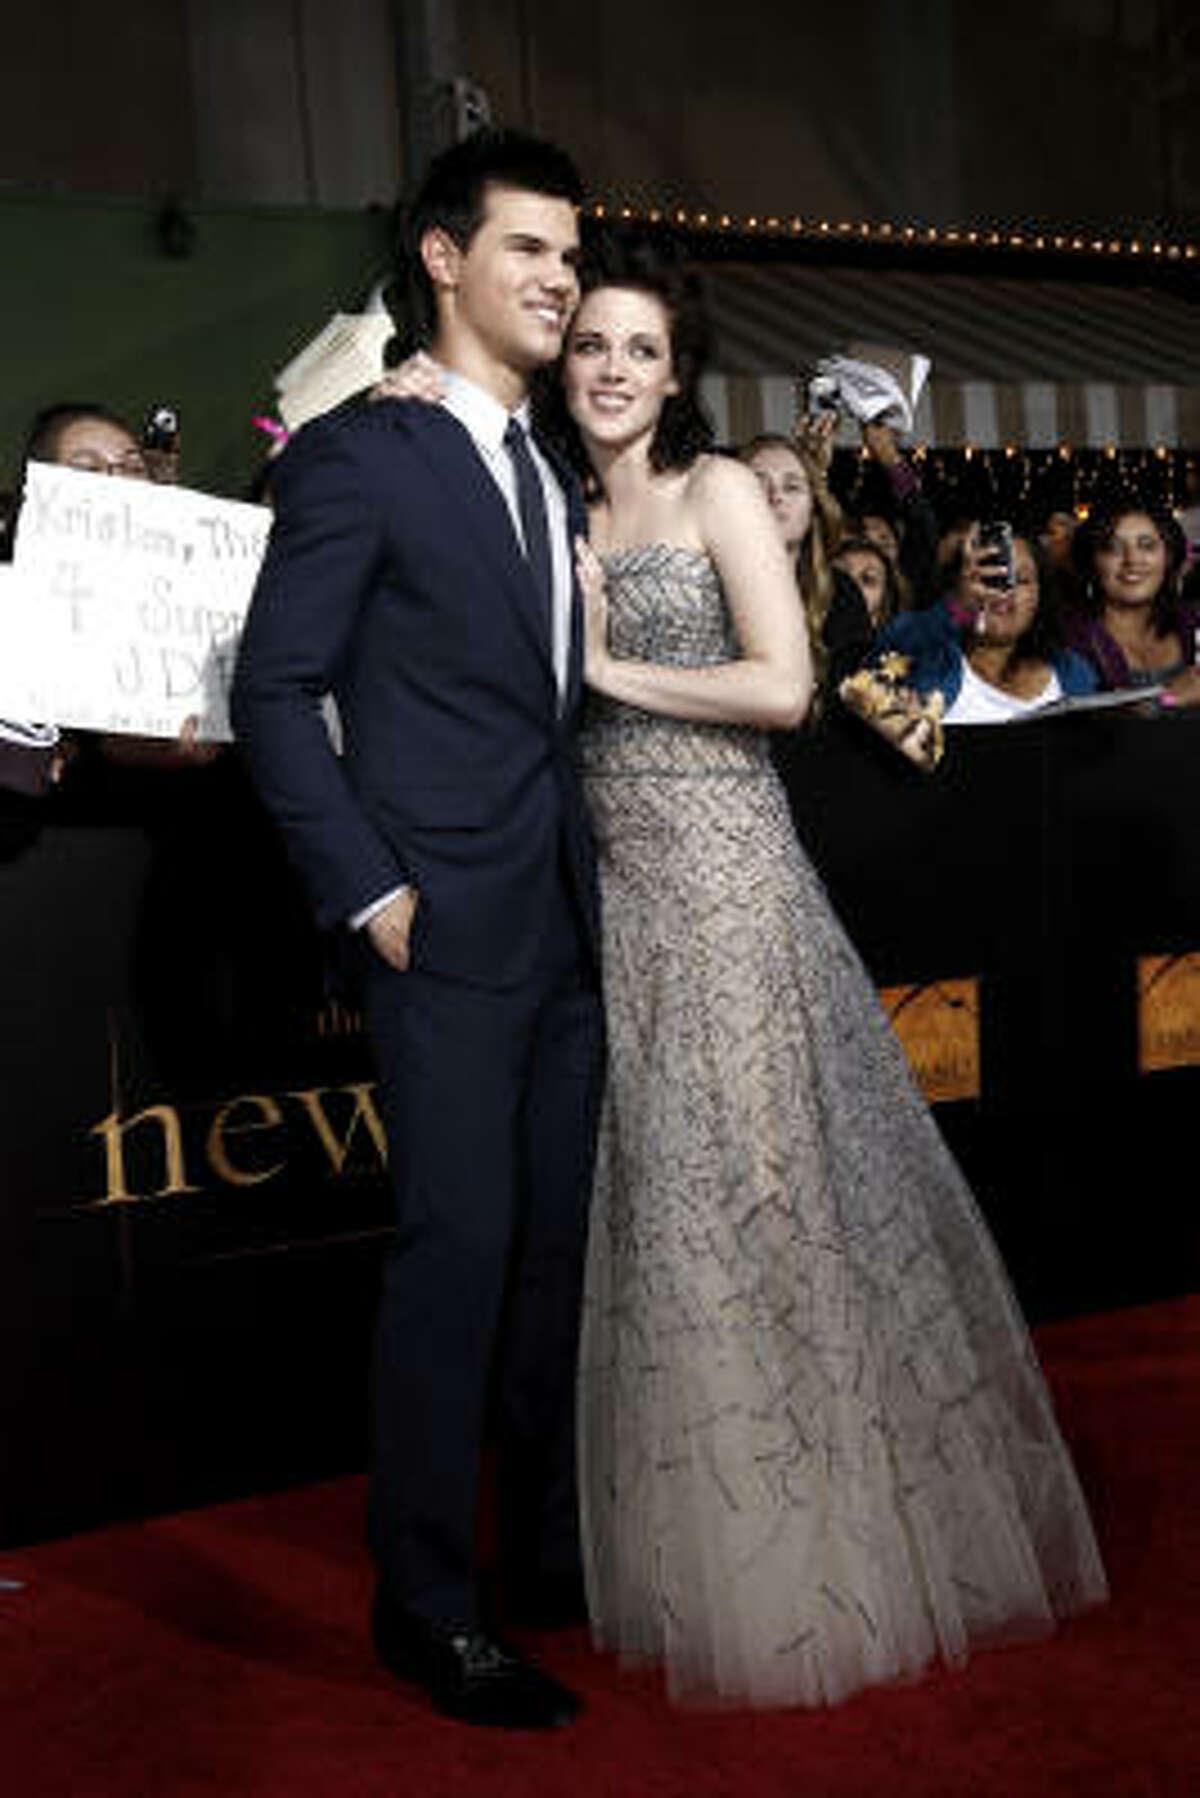 Taylor Lautner and Kristen Stewart arrive at The Twilight Saga: New Moon premiere.